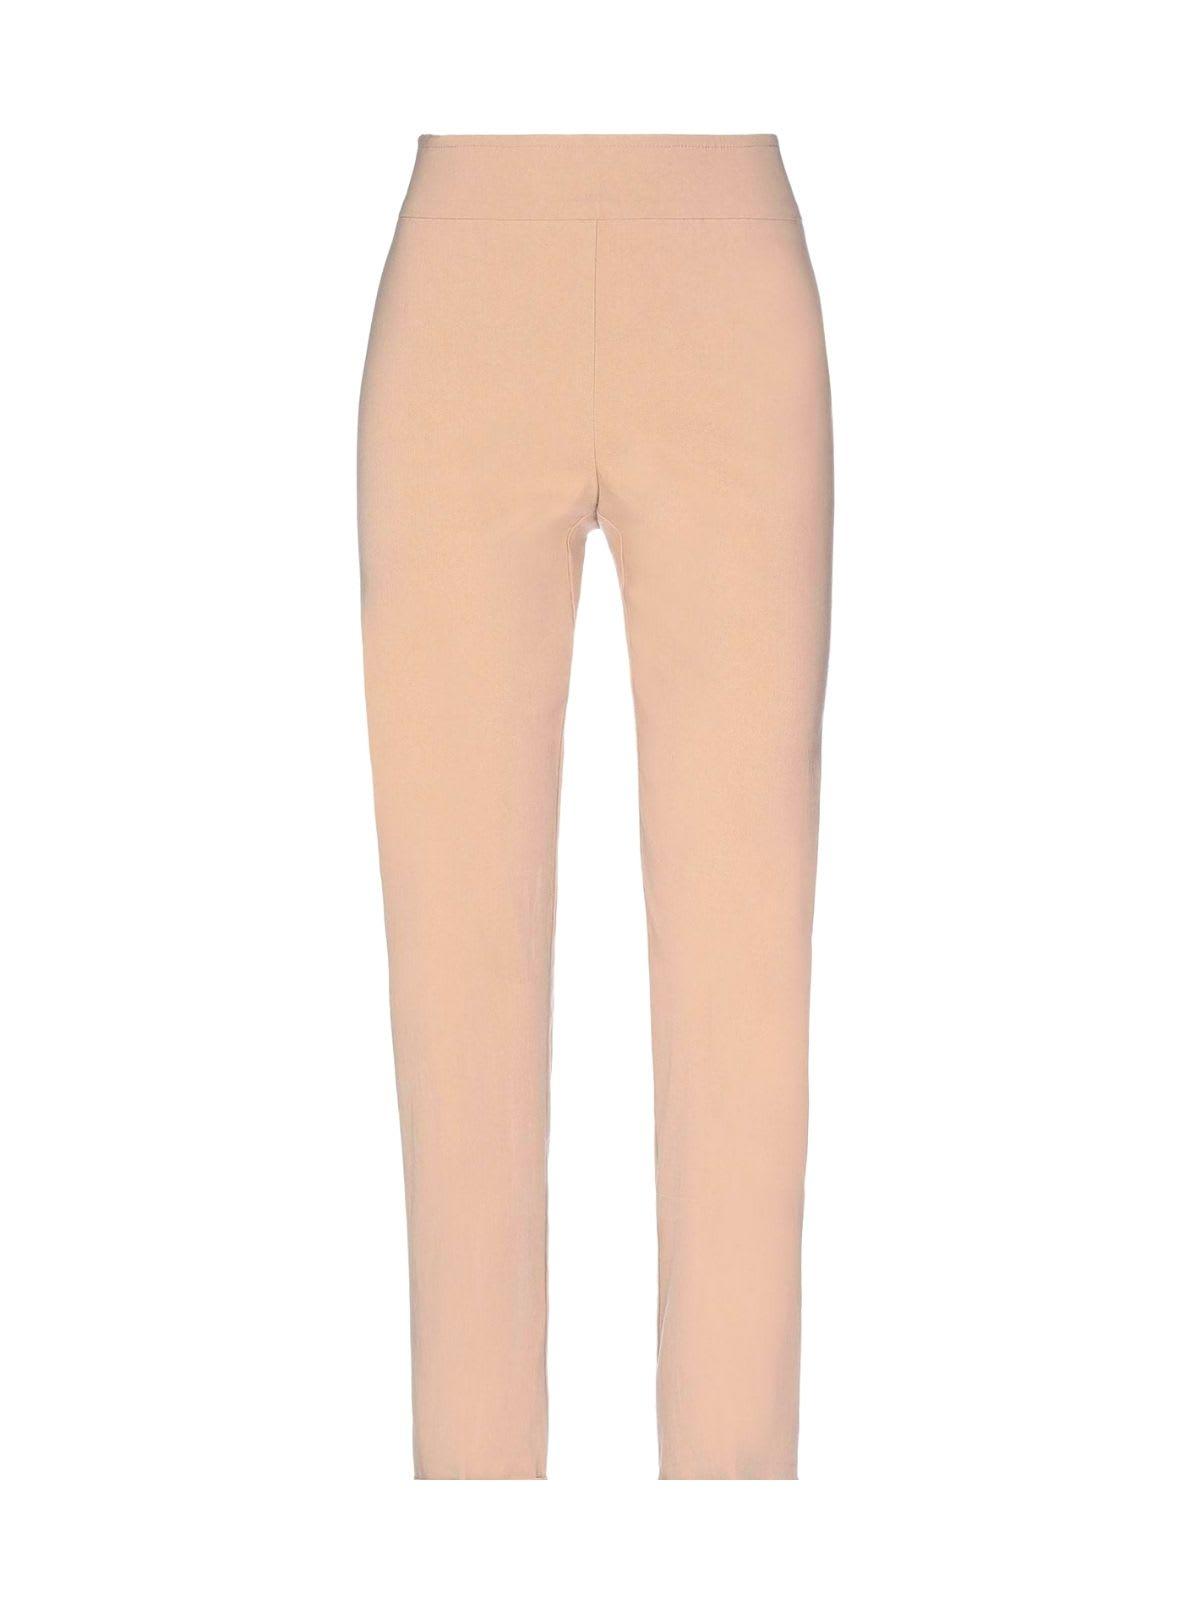 Short Slim Pants W/slit On Bottom